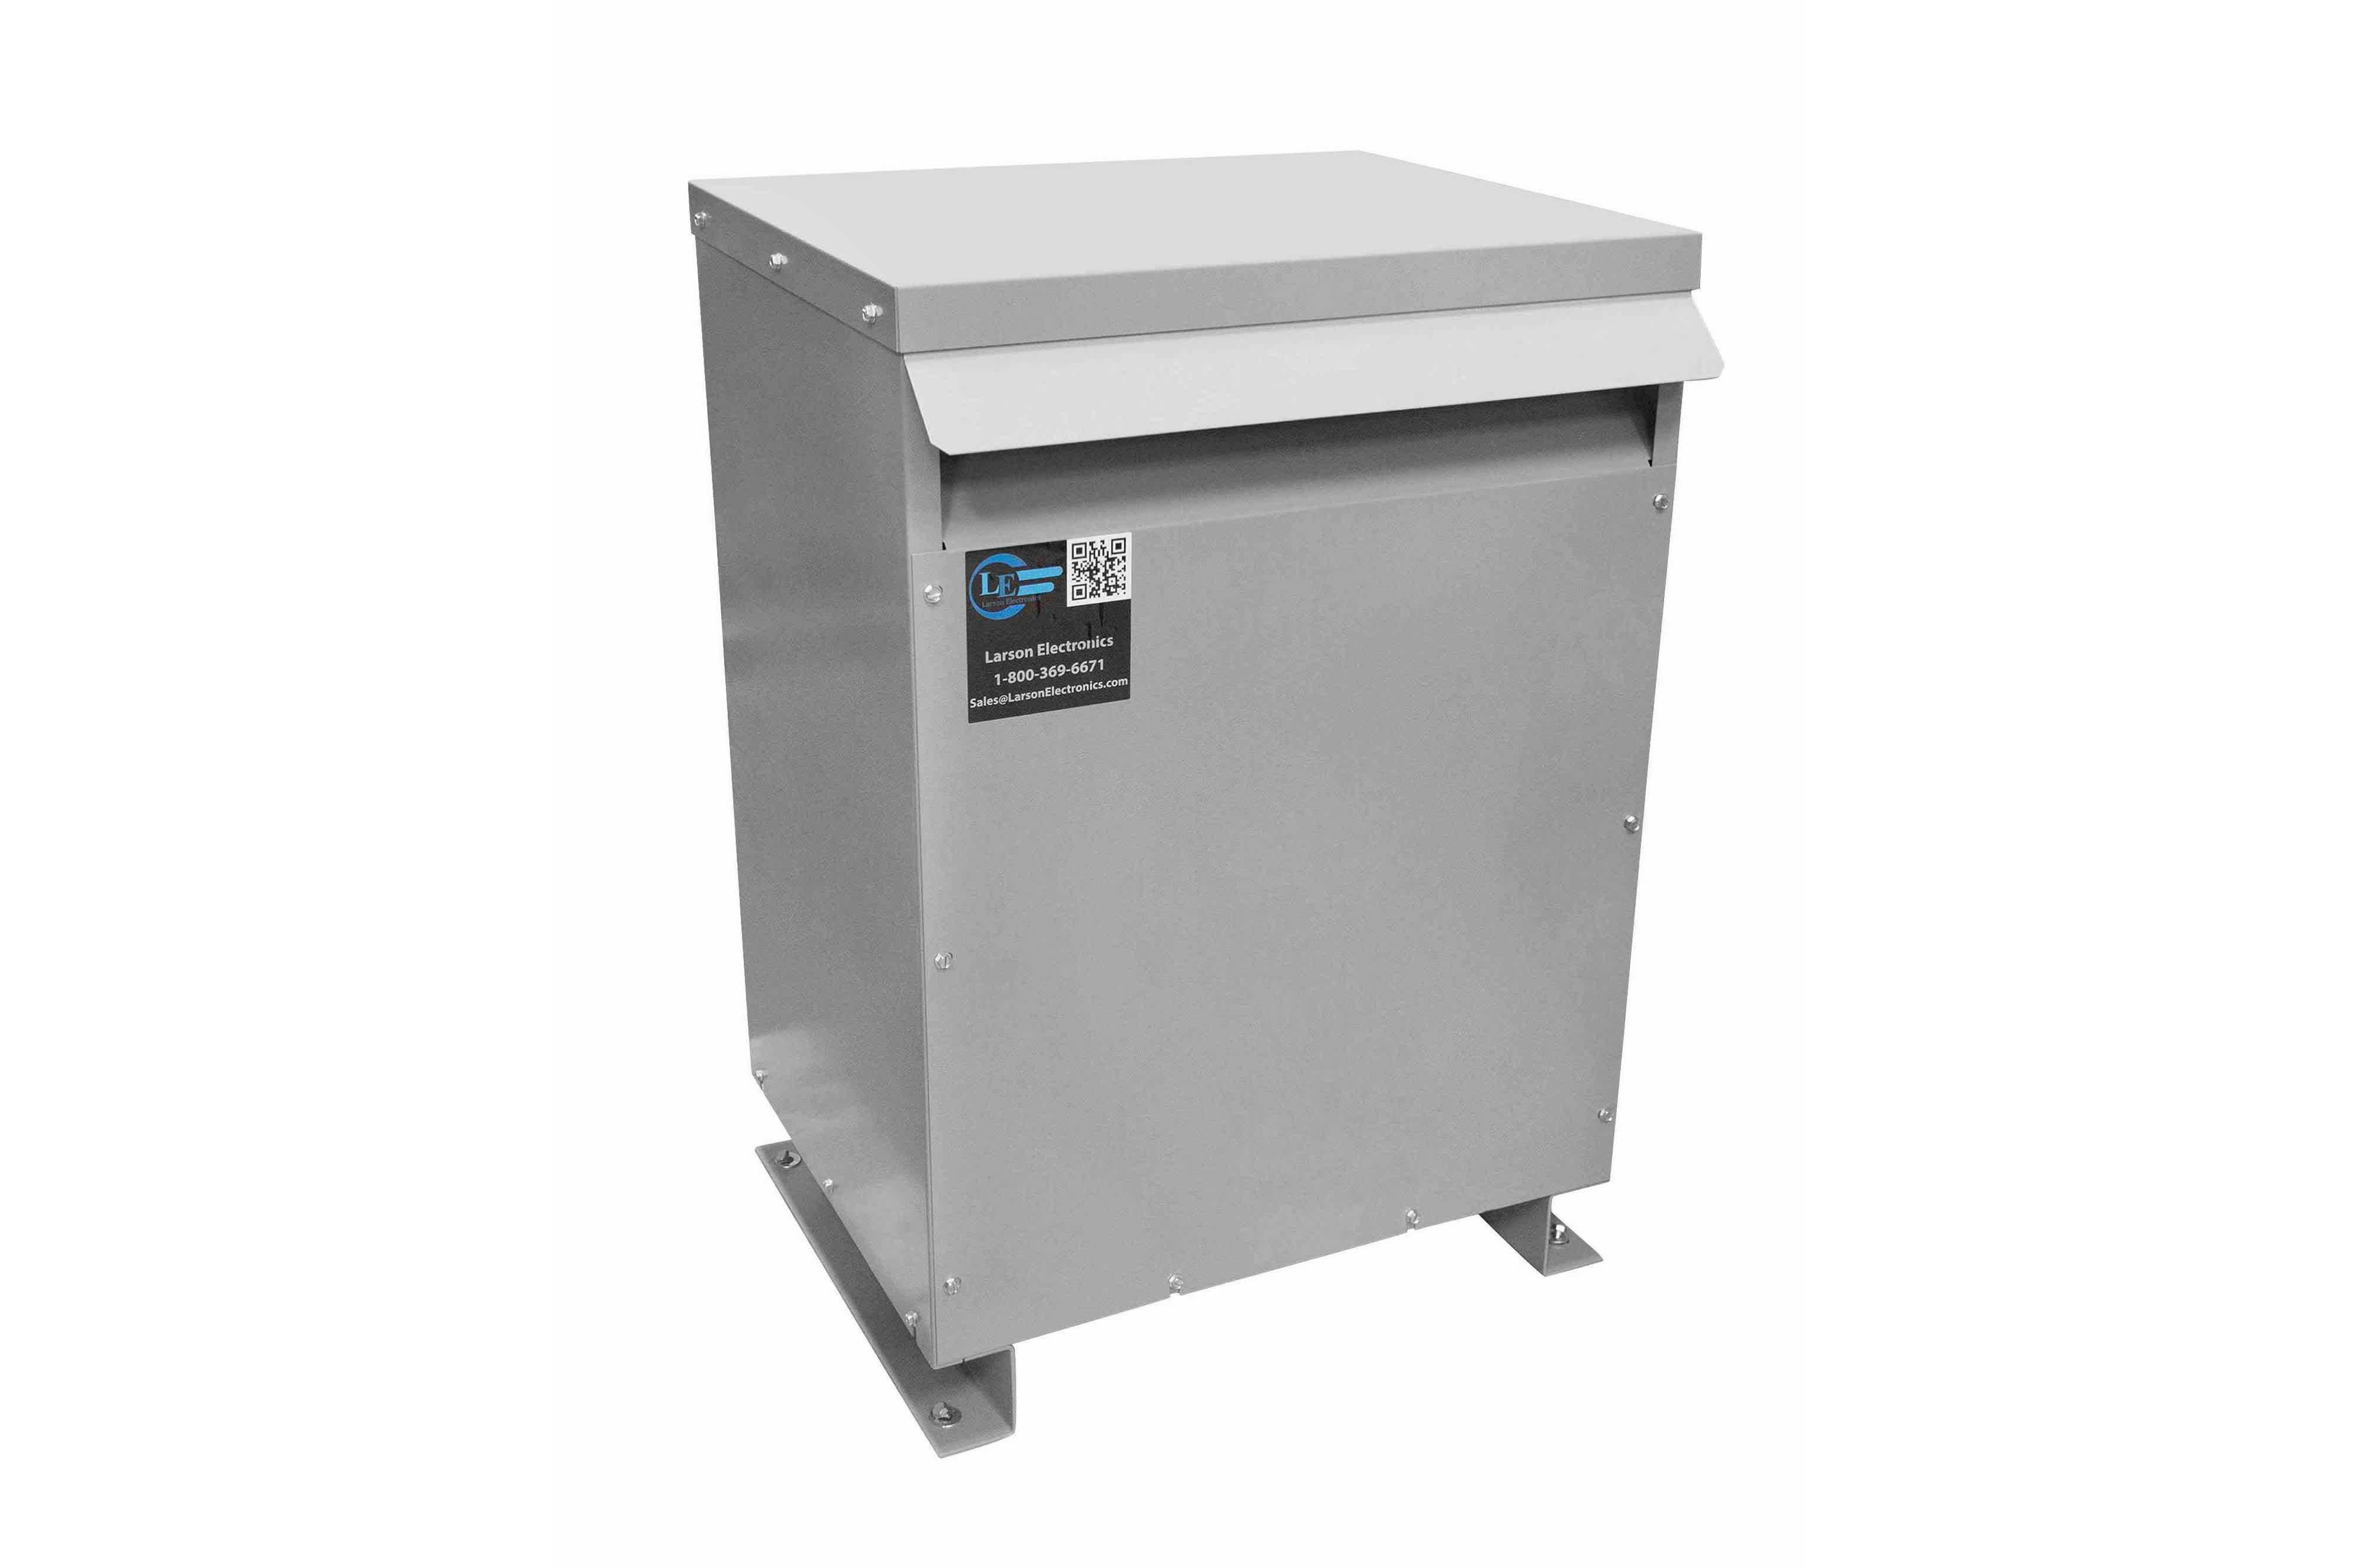 150 kVA 3PH Isolation Transformer, 415V Wye Primary, 240V Delta Secondary, N3R, Ventilated, 60 Hz